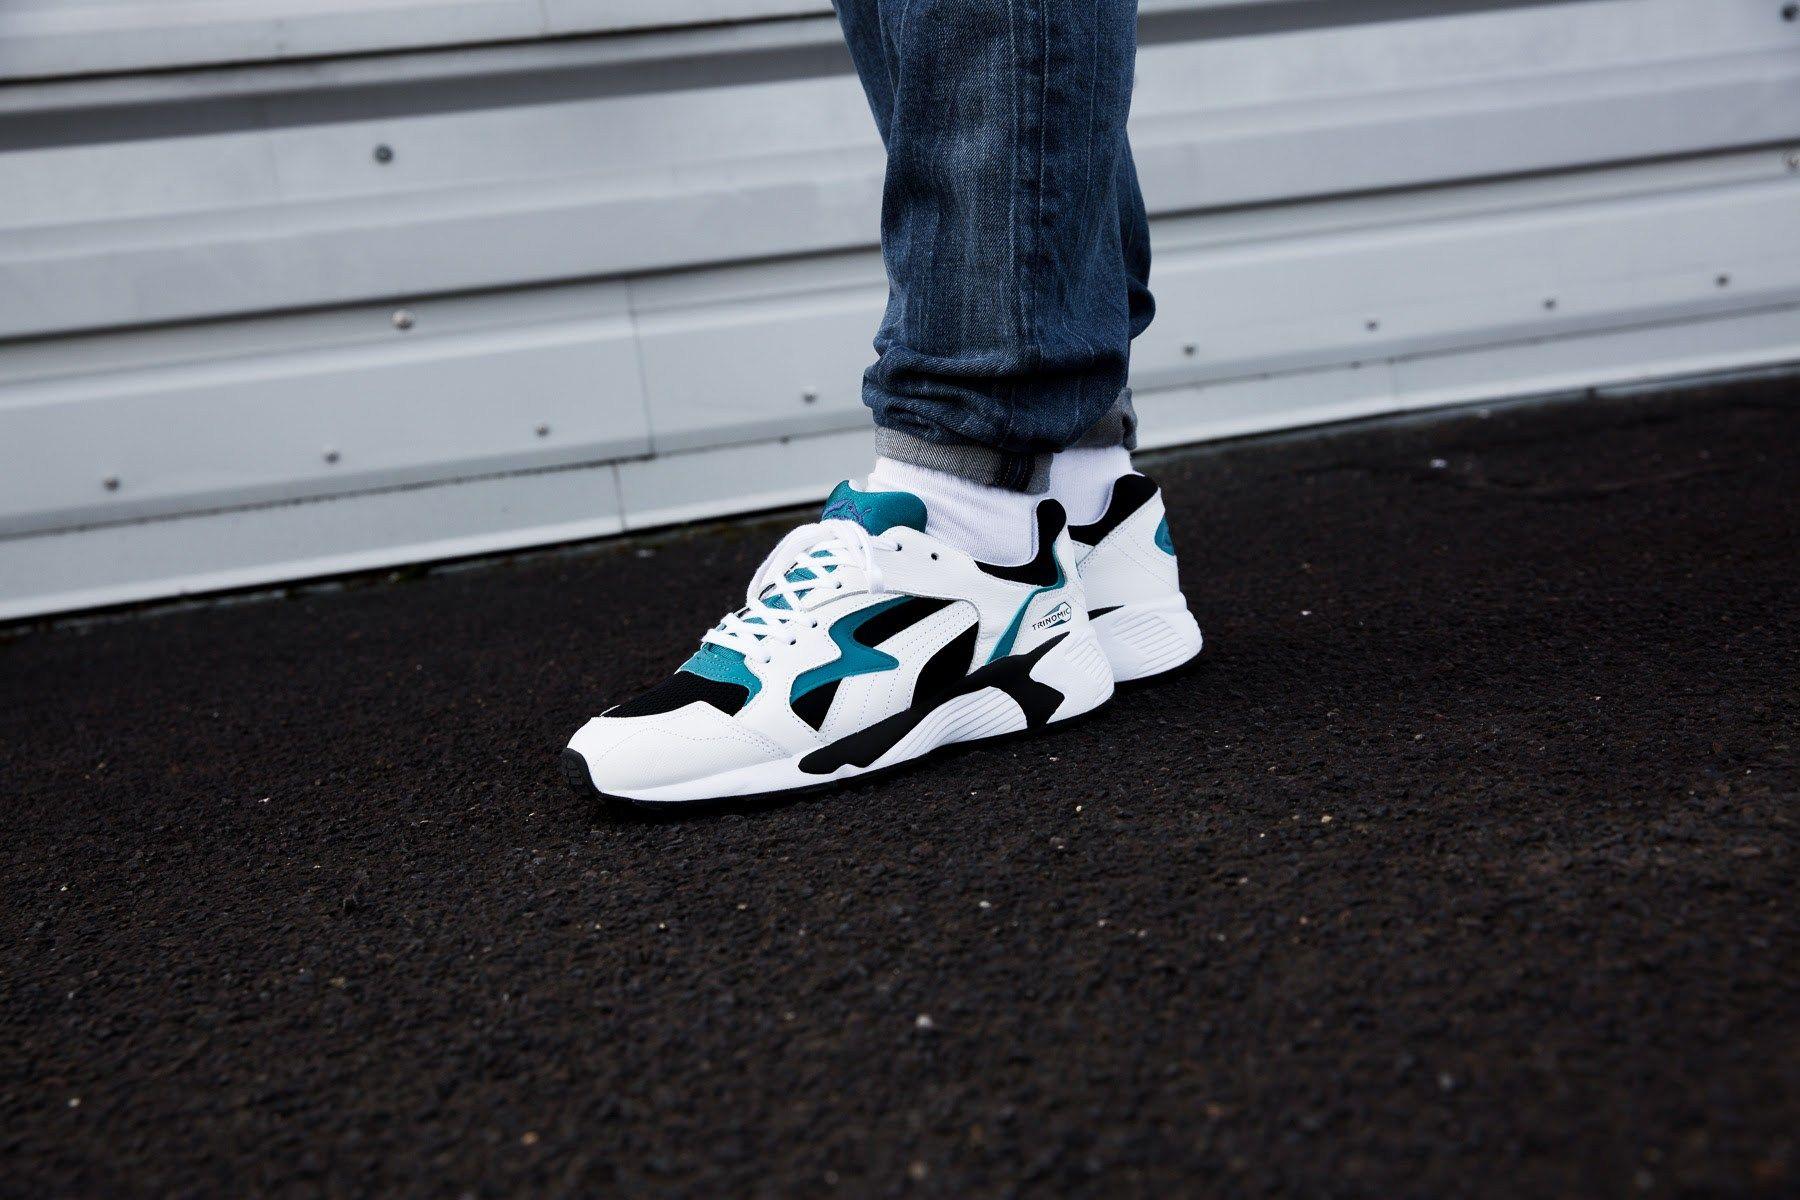 7175006380f4 PUMA Prevail OG Pack - EU Kicks  Sneaker Magazine